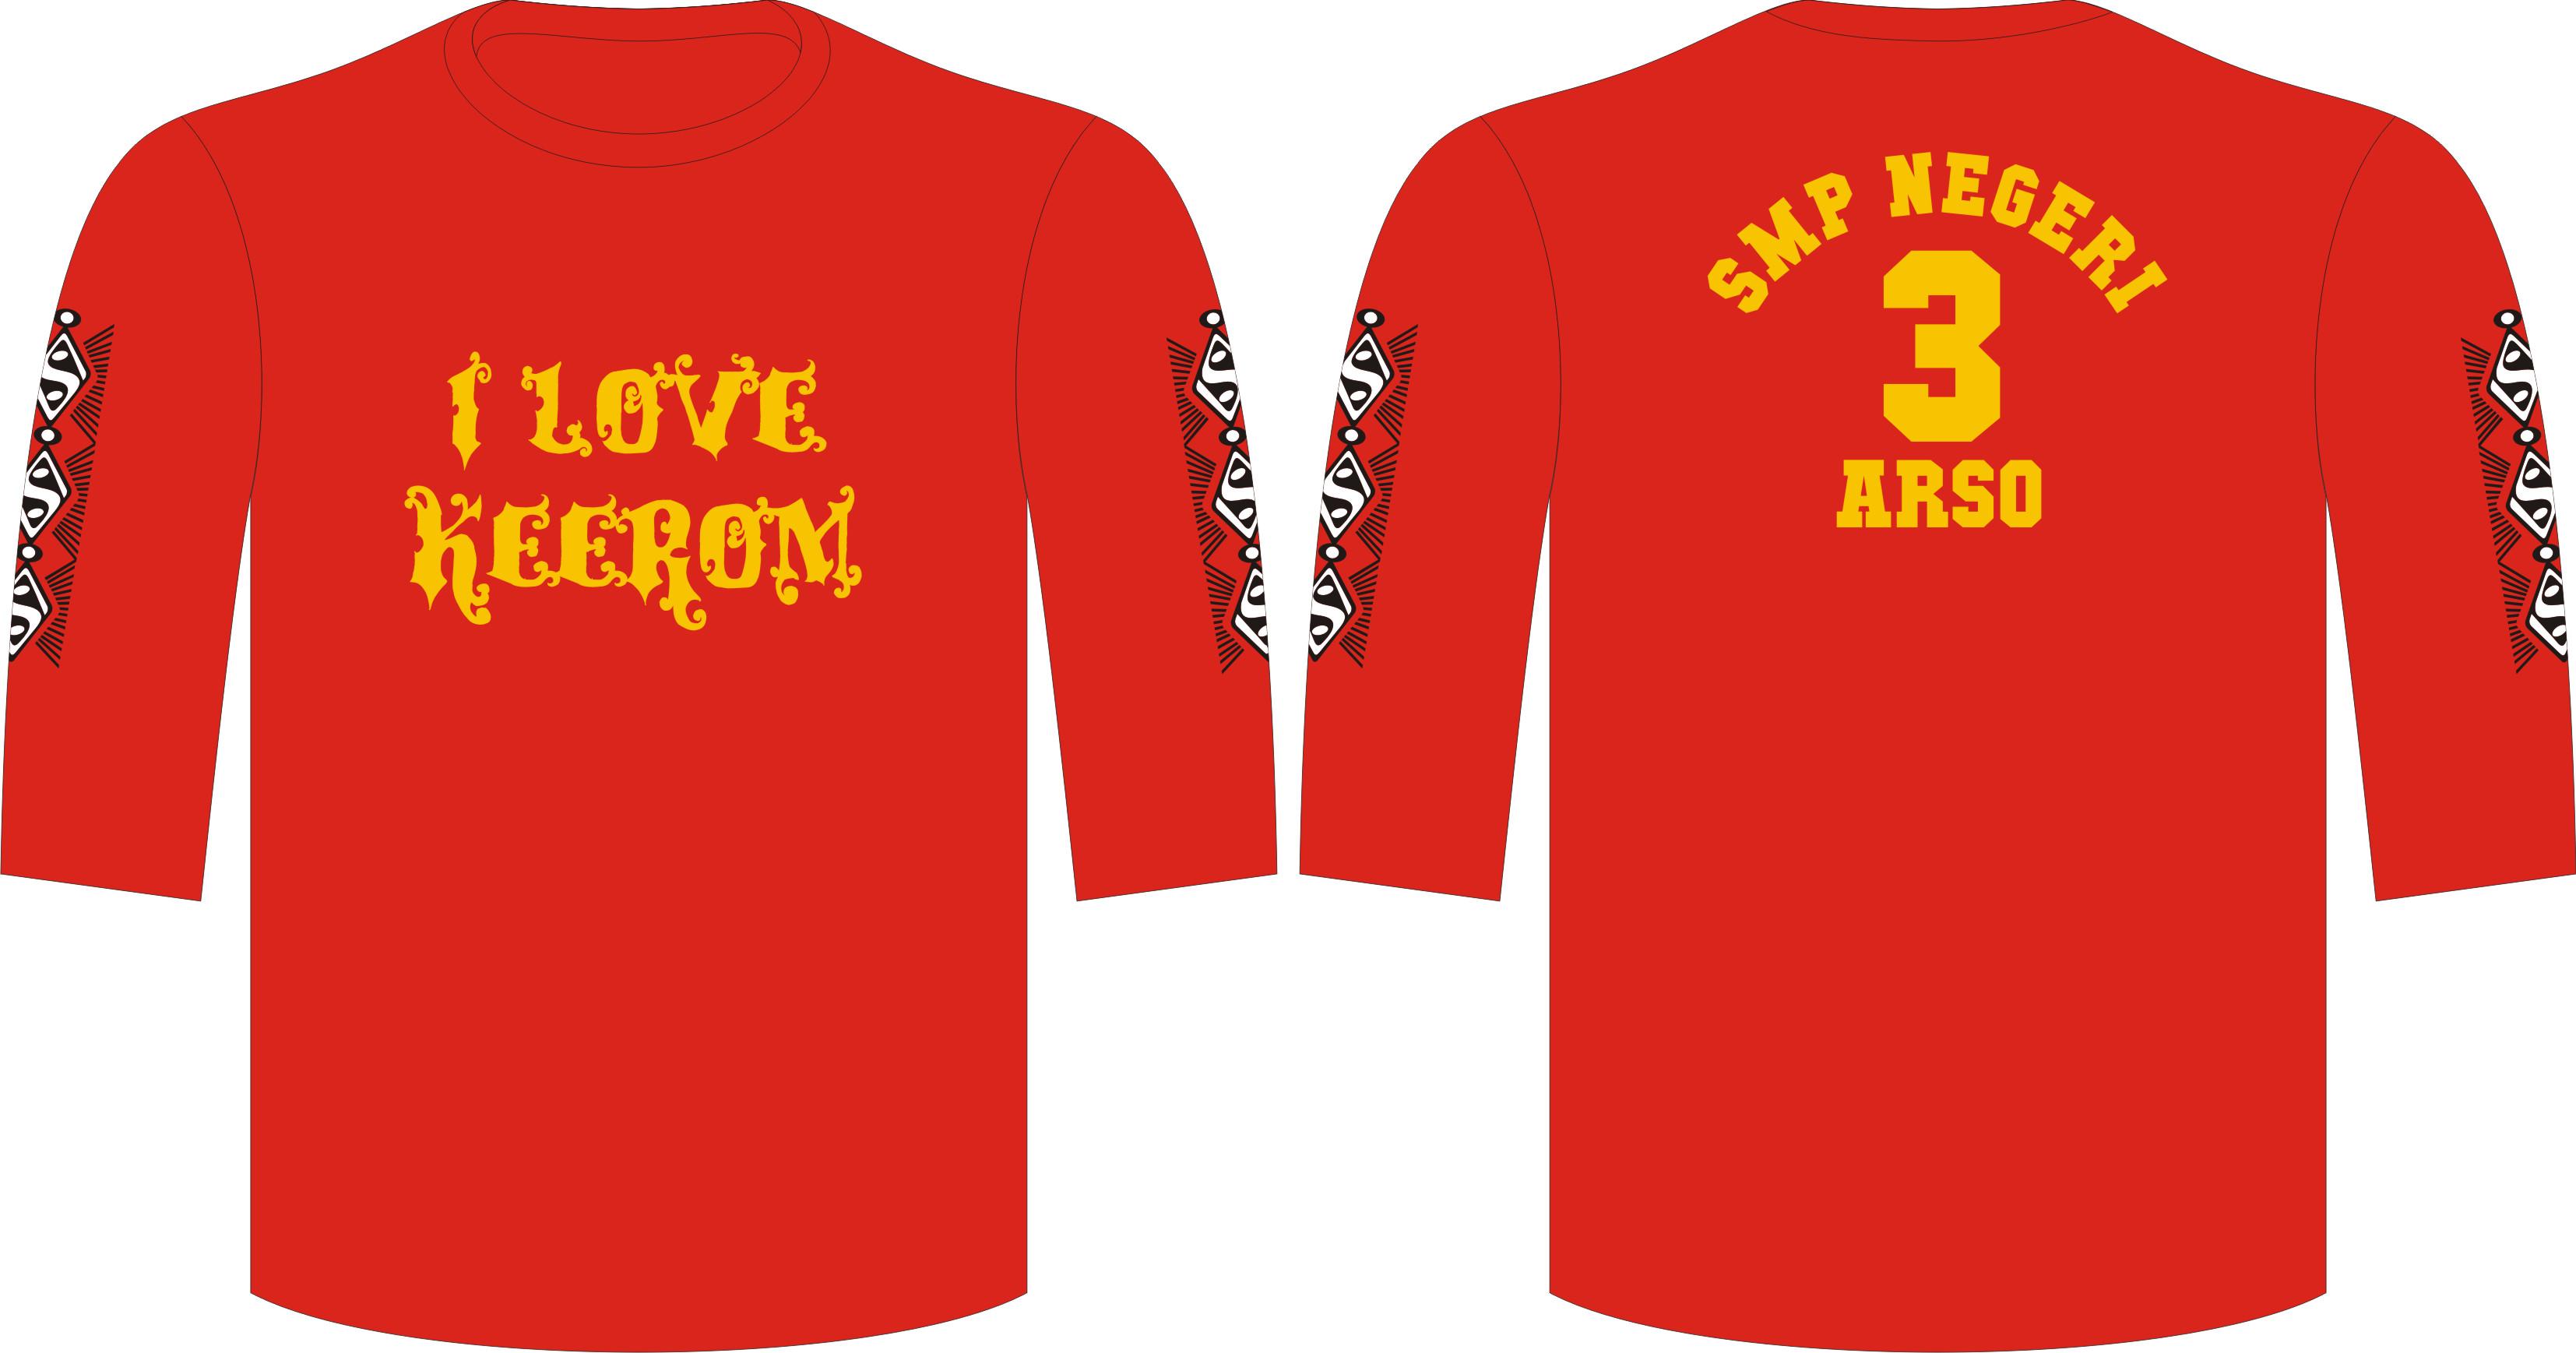 Seragam Kaos Kelas Arso, T-Shirt 3/4